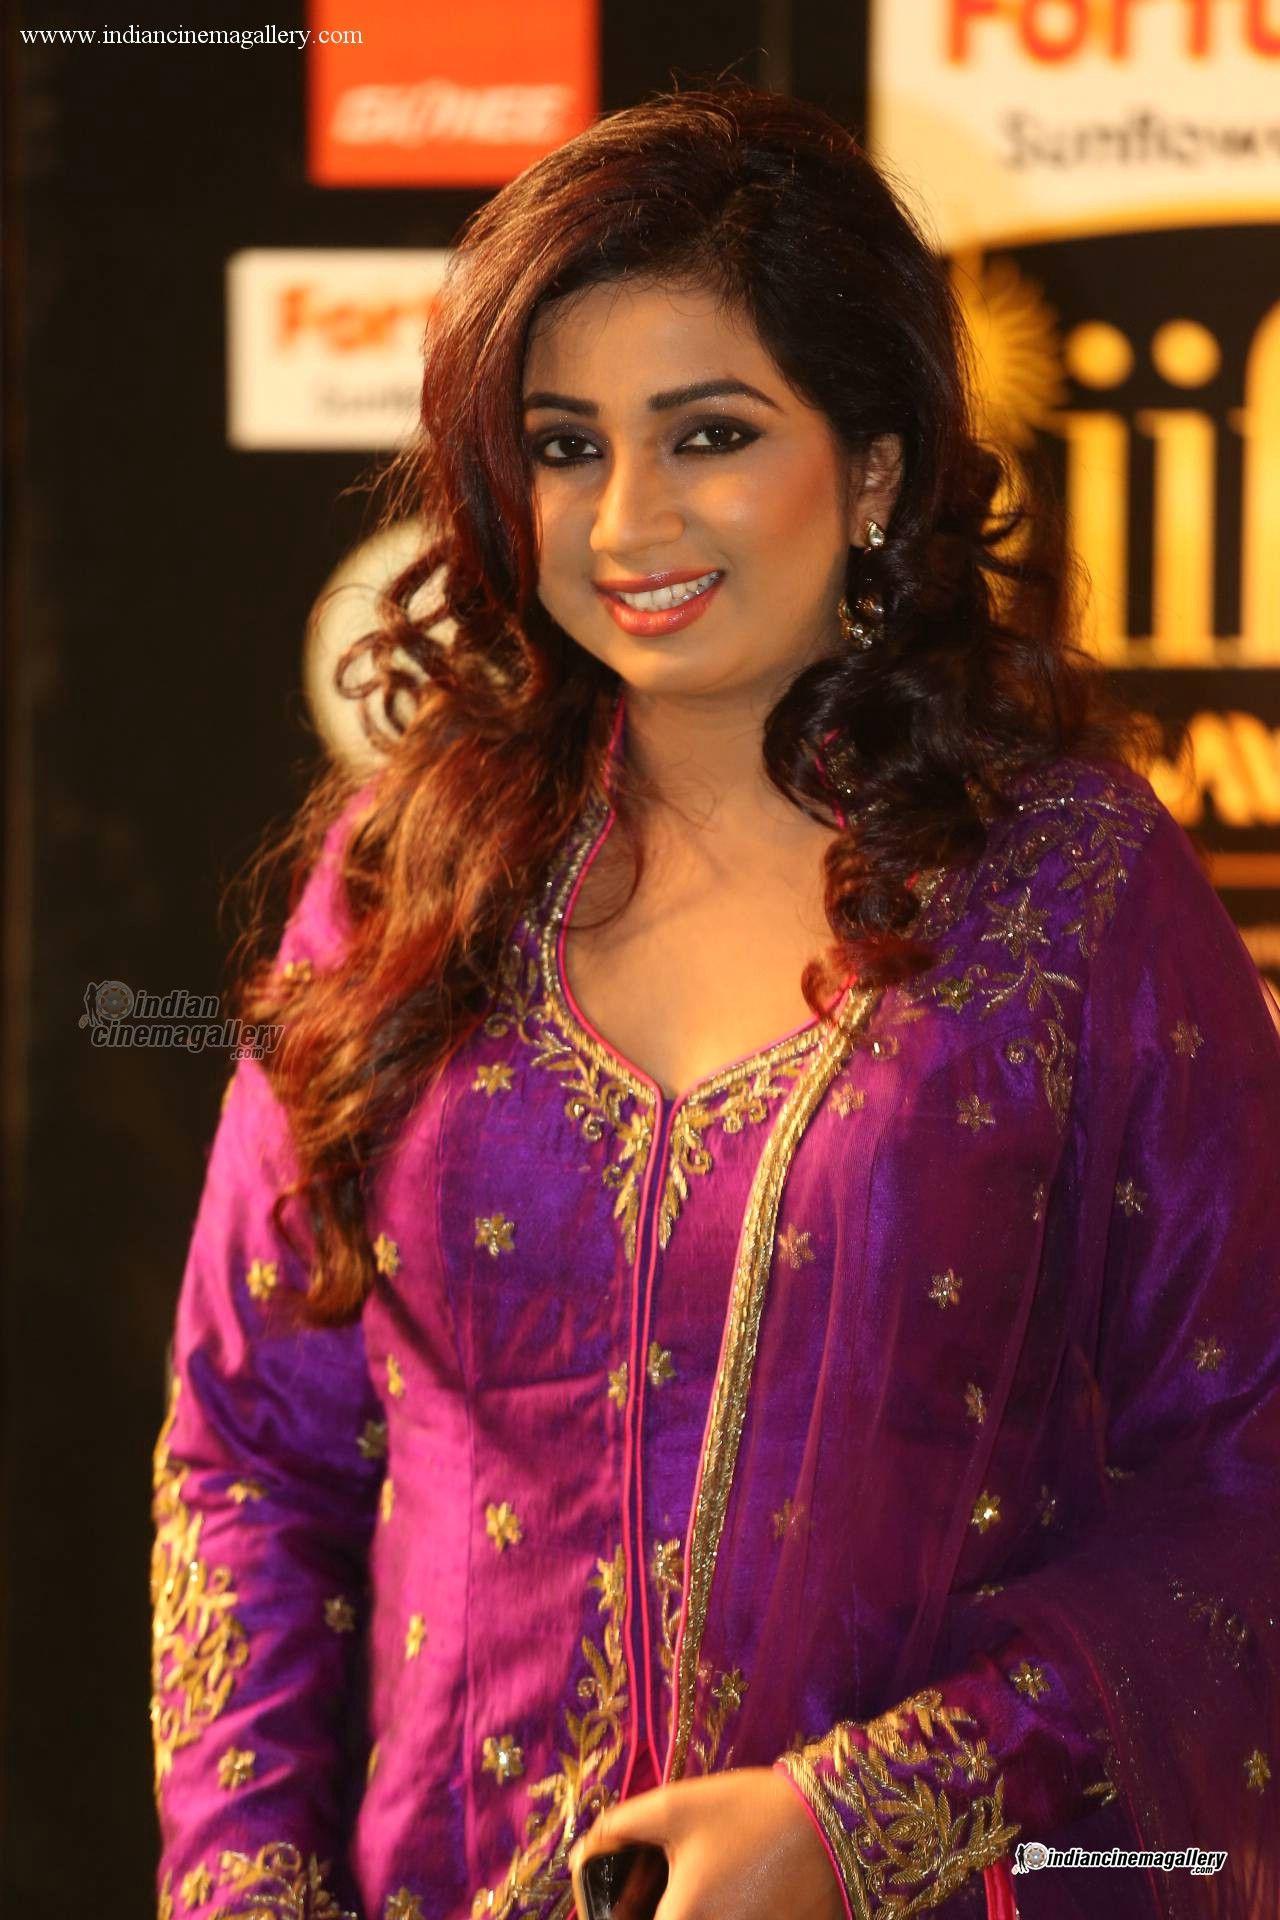 Indian actress hot photos free download Brown v. Board of Education: Photographs (Virtual Programs)